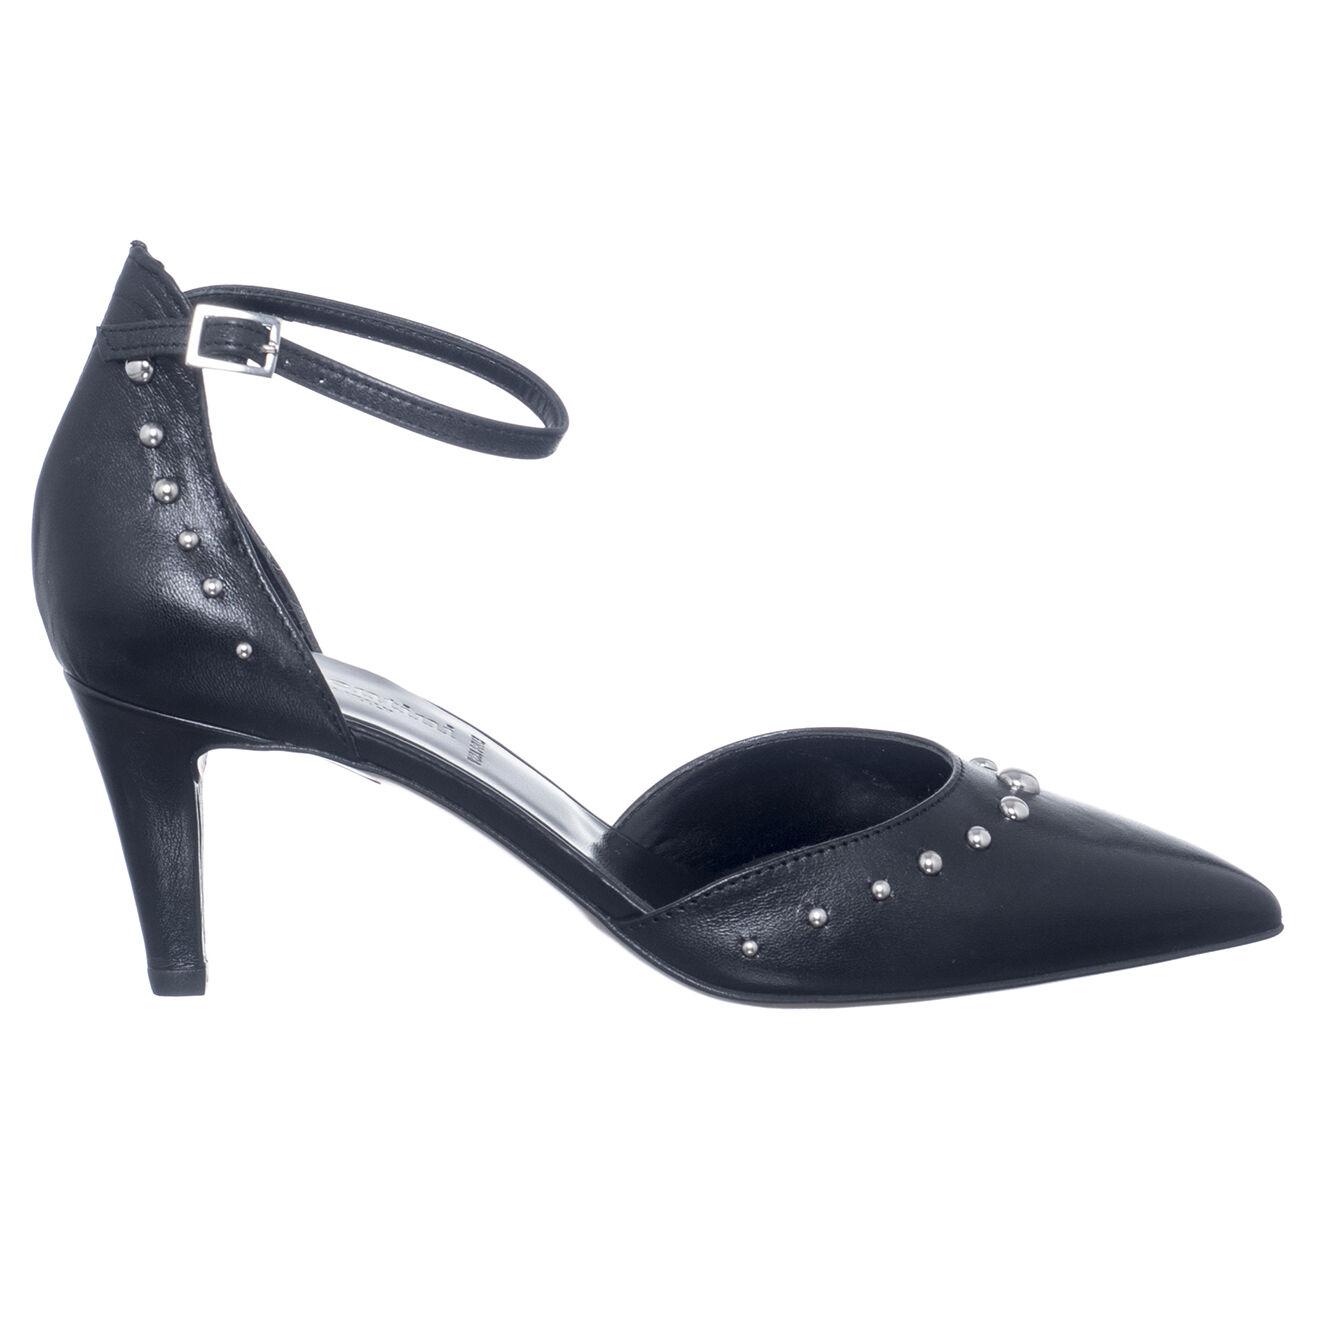 Escarpins en Cuir Diana noirs - Talon 7 cm